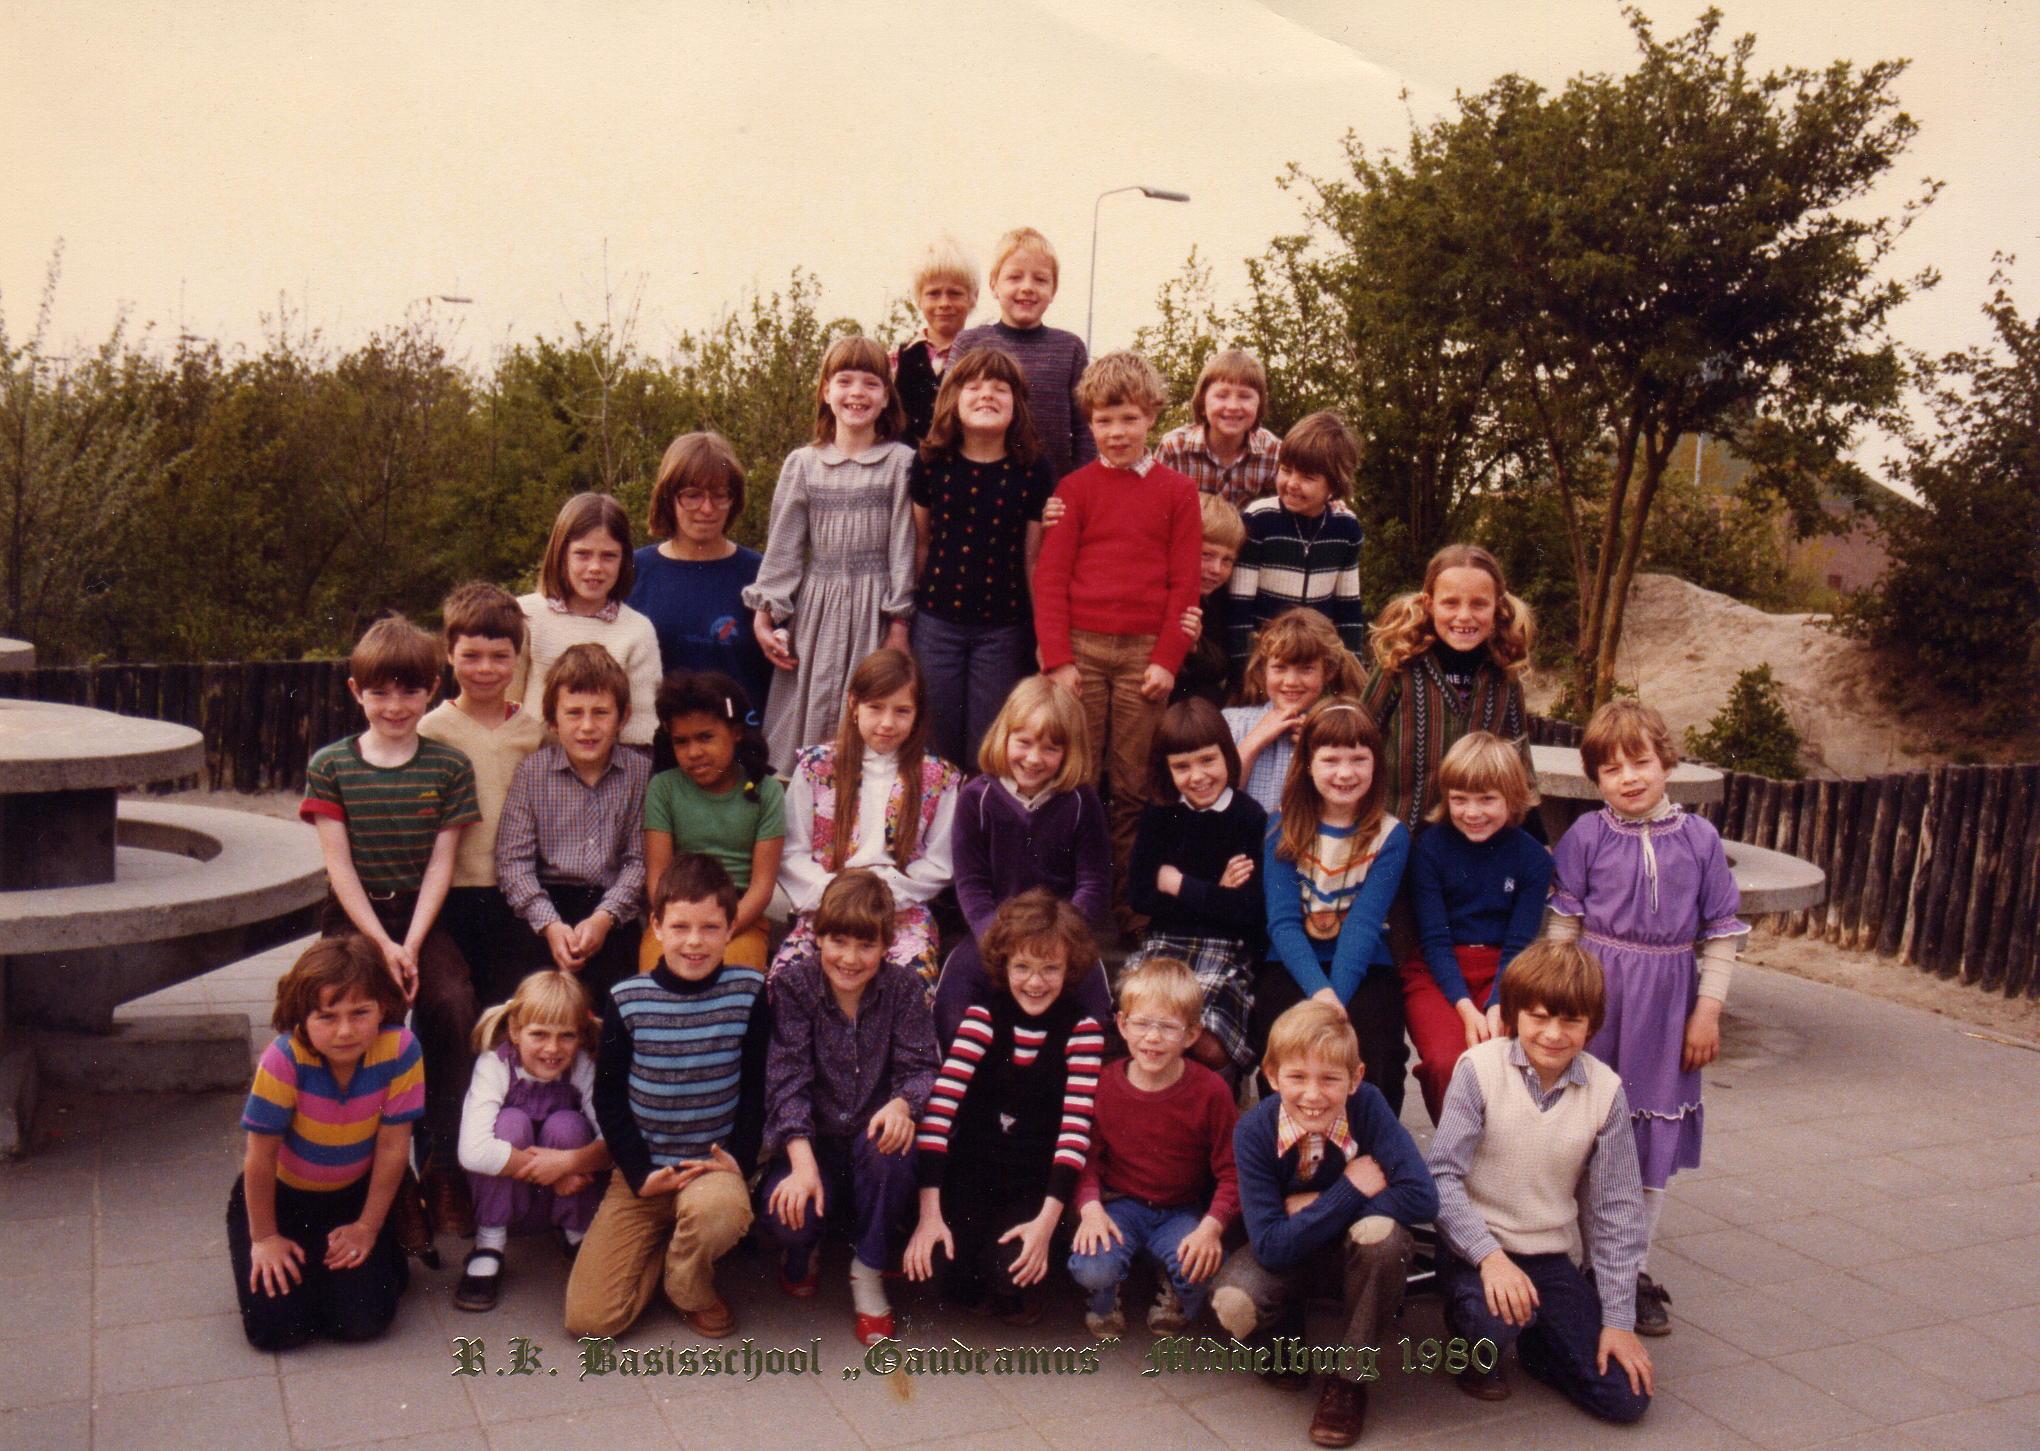 R.K. gaudeamusschool foto